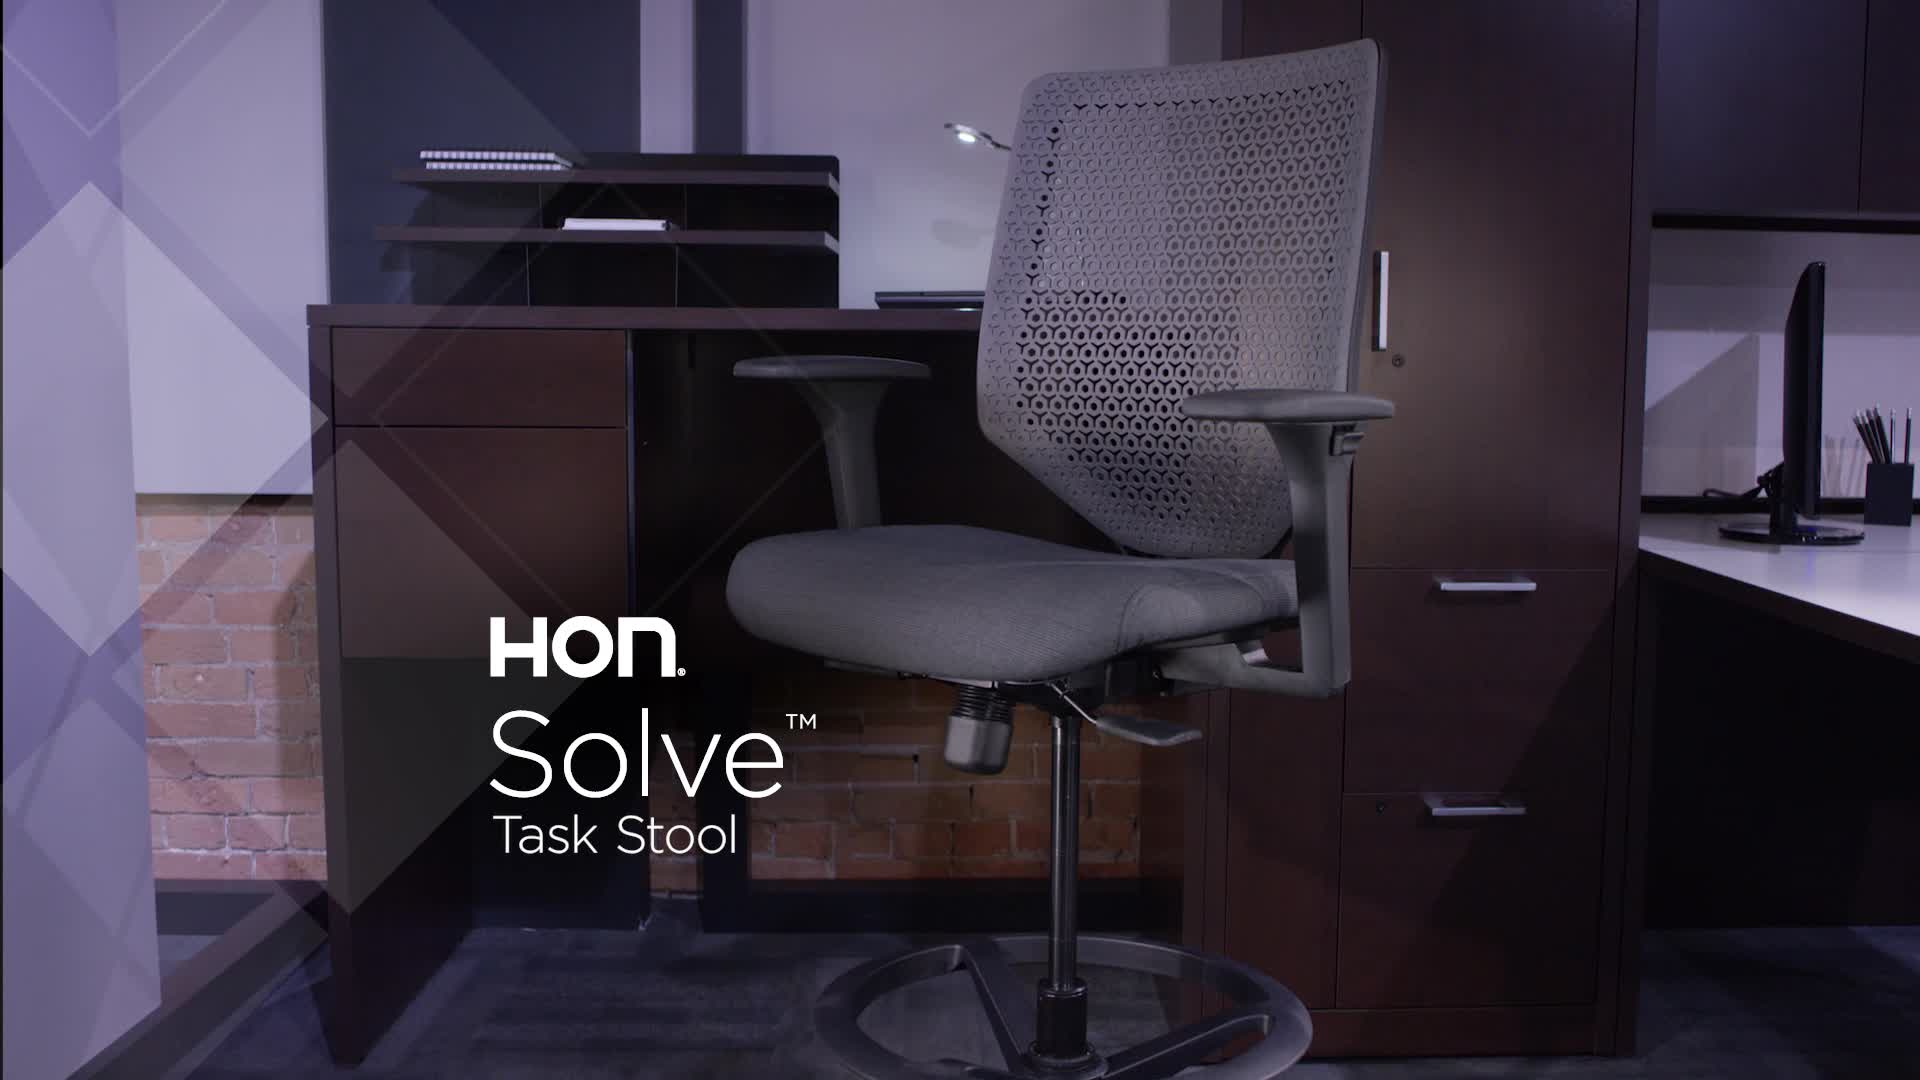 Solve Task Stool video link